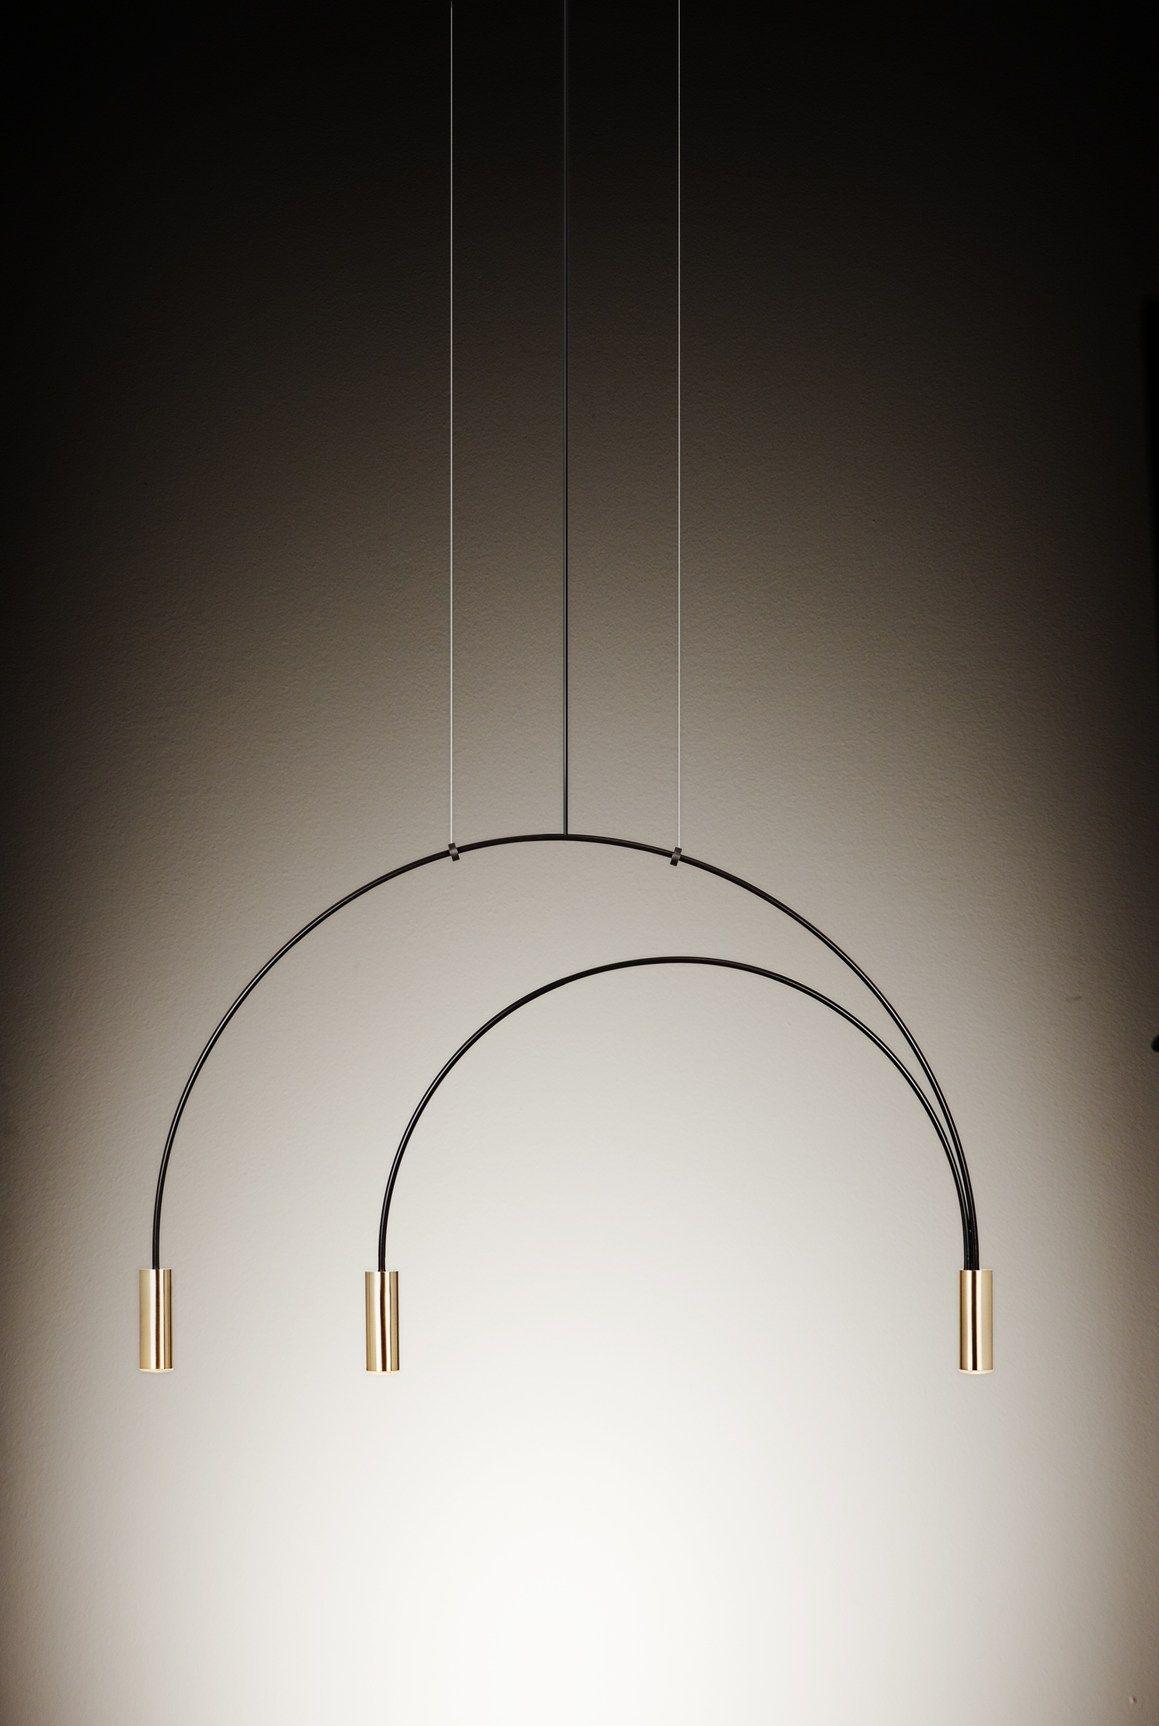 Volta Lighting In Balance An Ethereal Presence By Estiluz